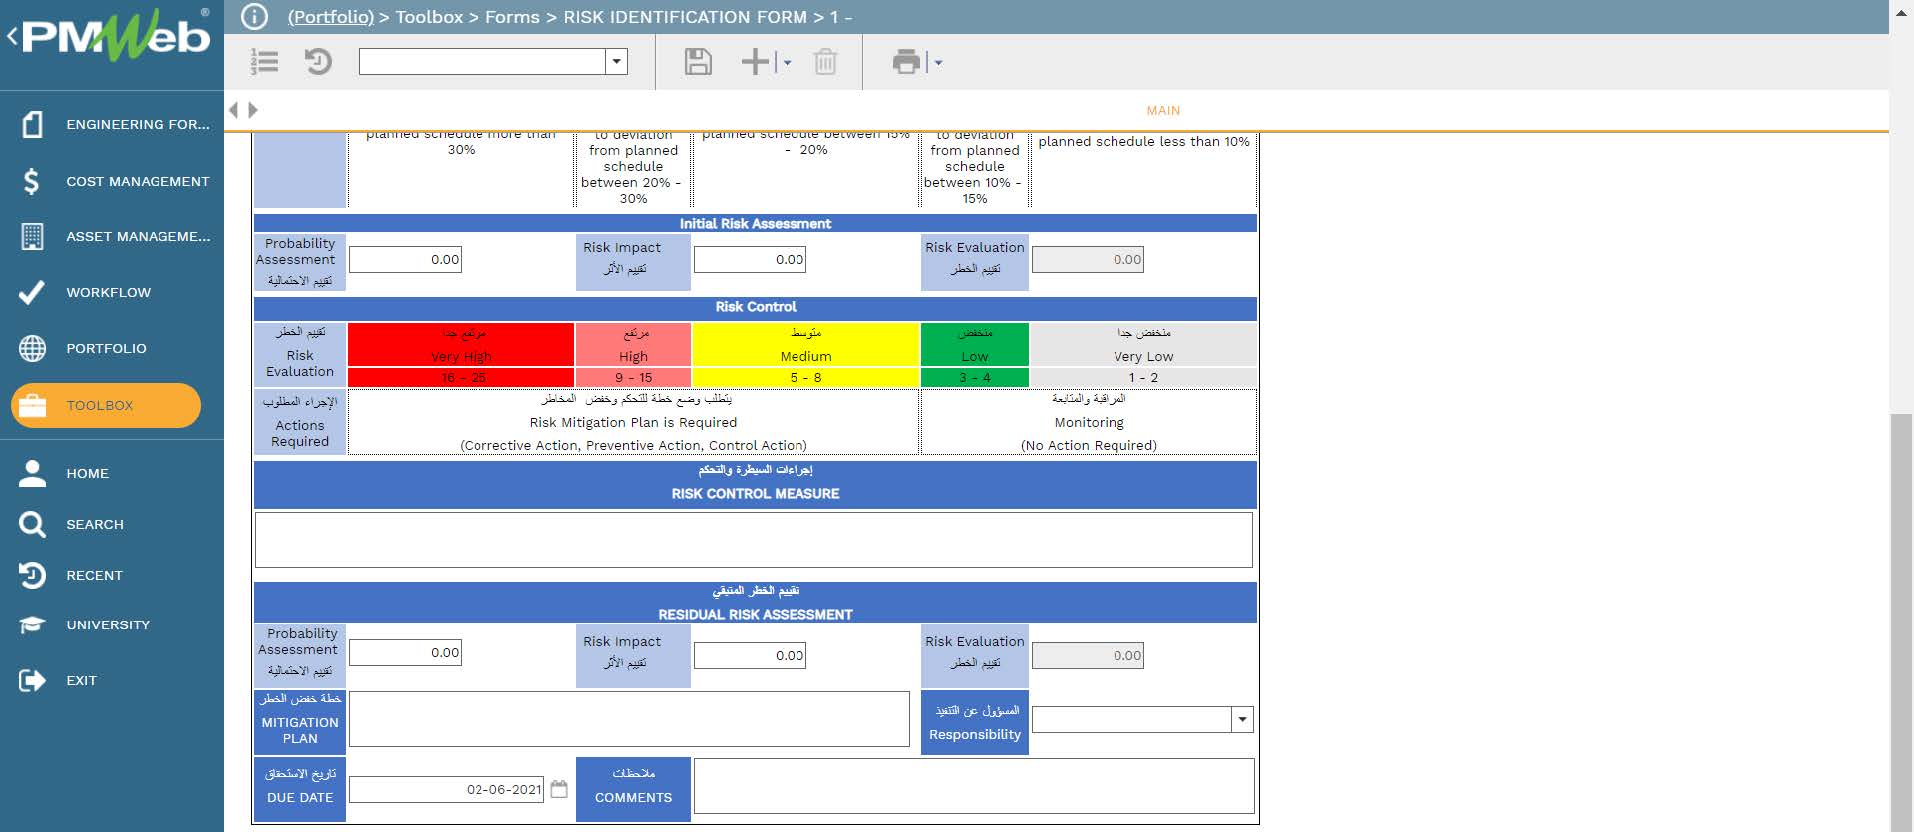 PMWeb 7 Tools Forms Risk Identification Form Main